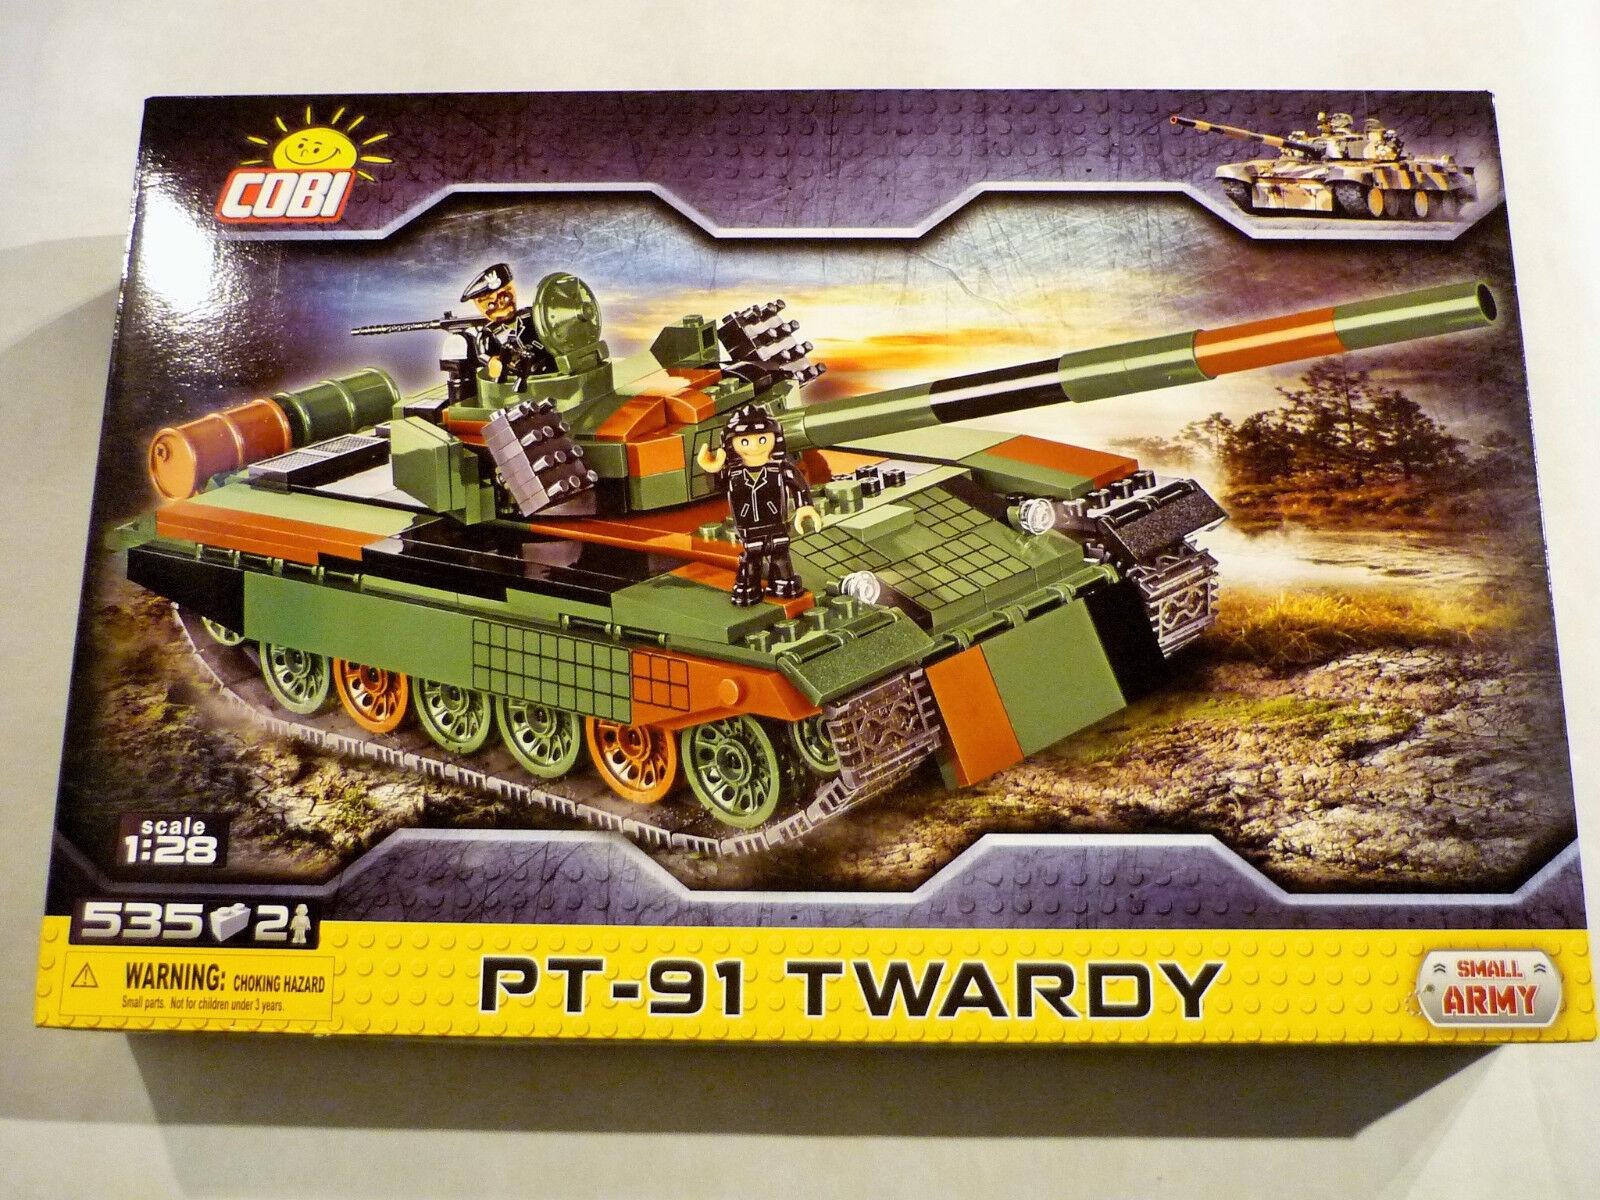 COBI 2612 - PT-91 Twardy - Small Army Polnischer Kampfpanzer NEU OVP